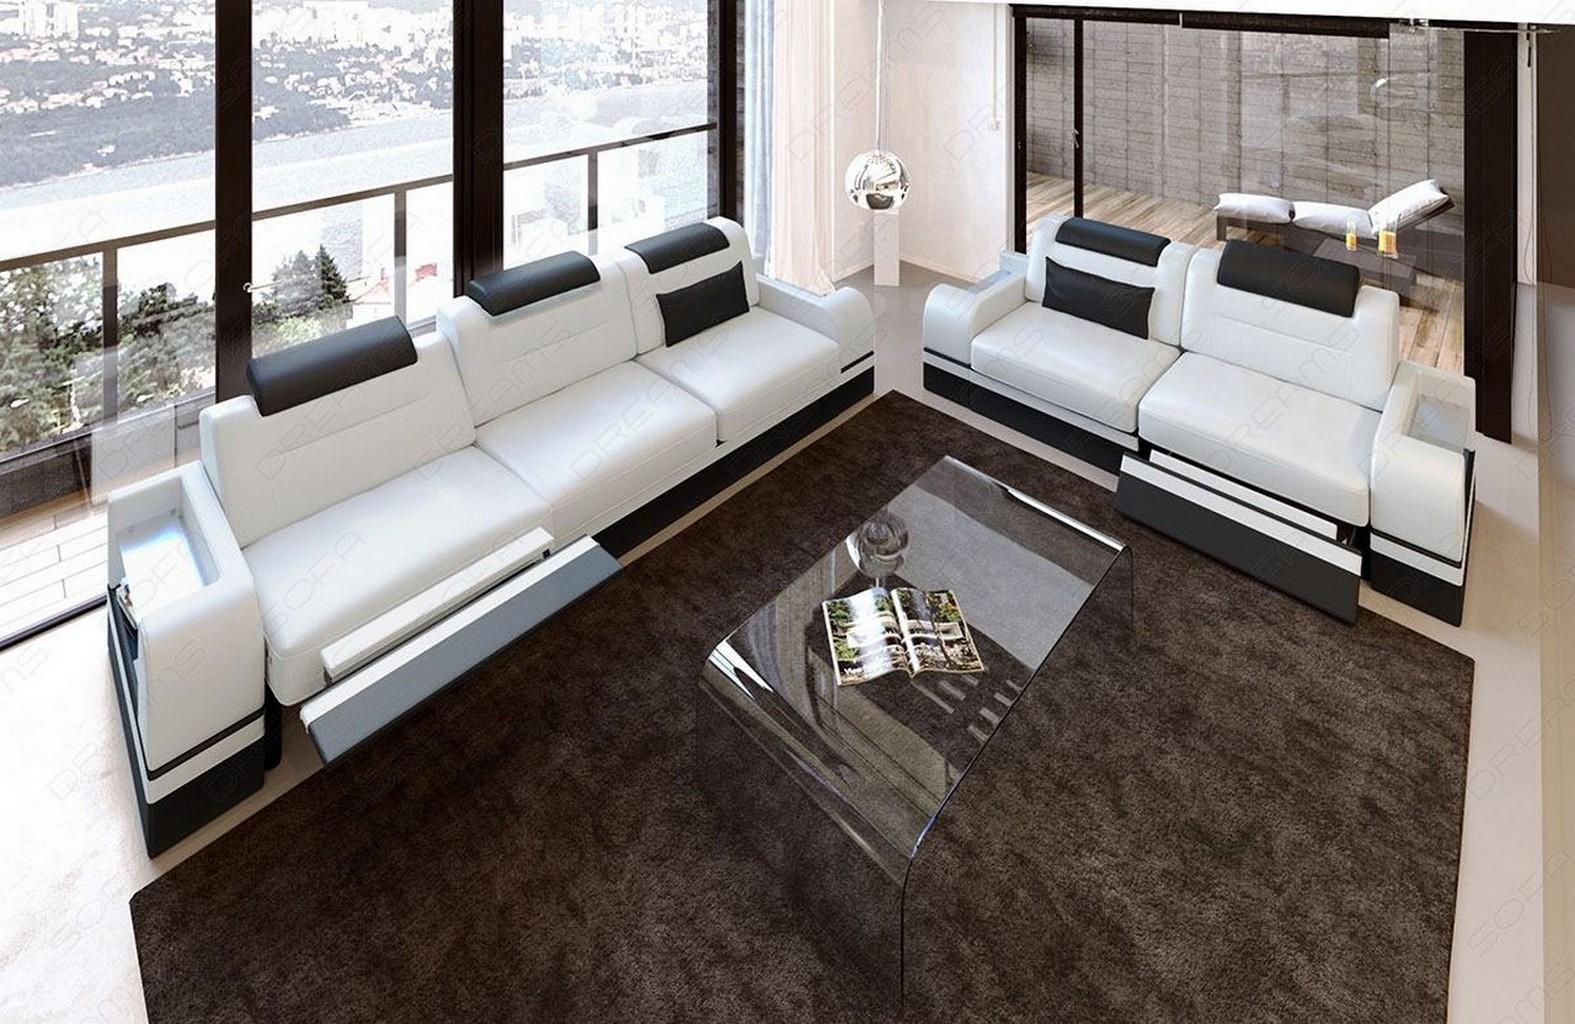 Exclusive Couchgarnituren exclusive couchgarnituren hausdesign pro